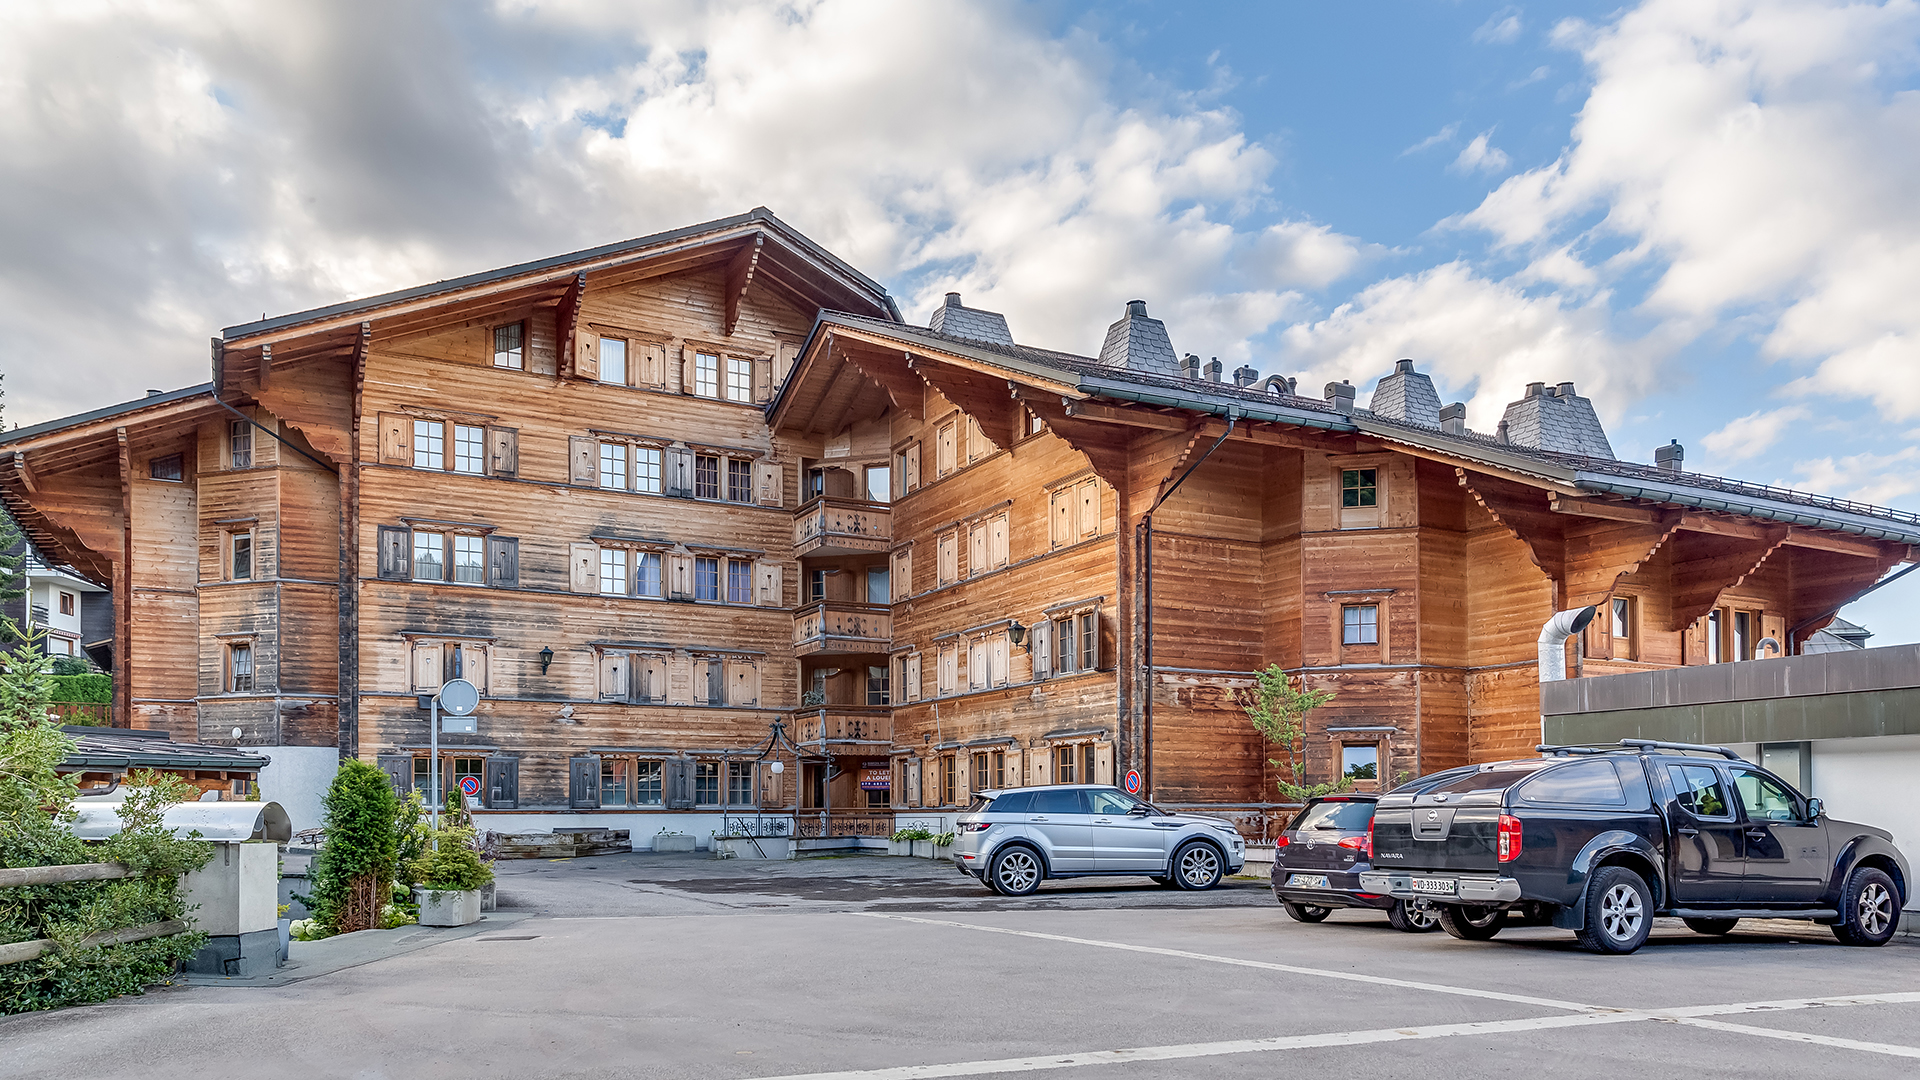 Daphne Apt Apartments, Switzerland